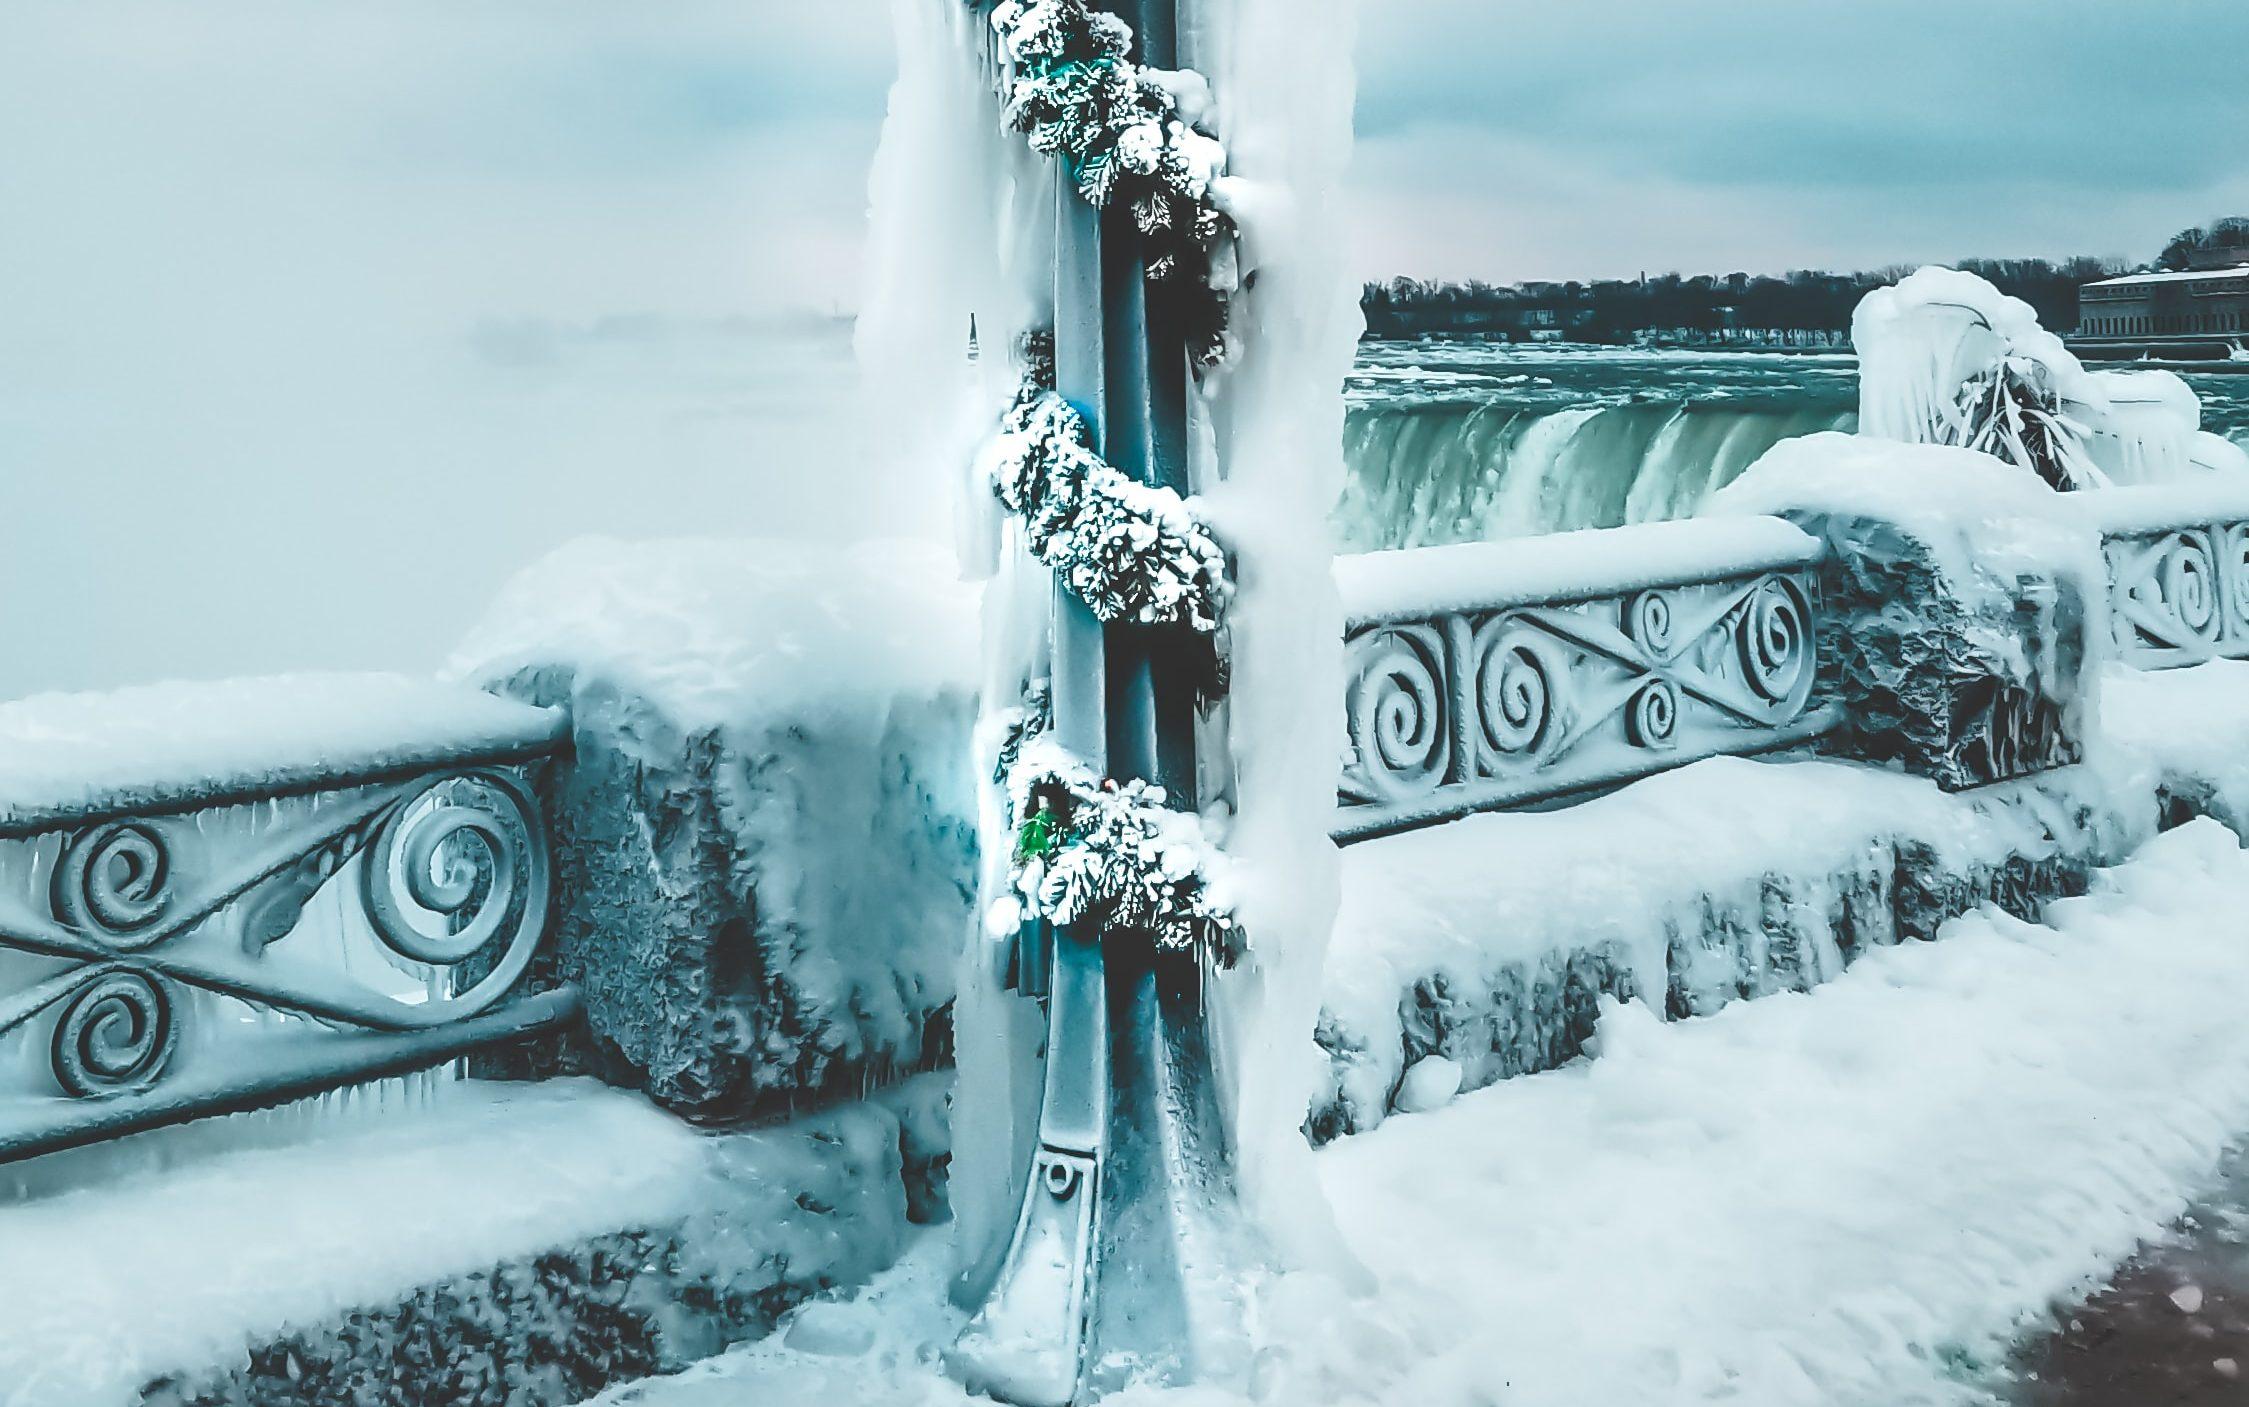 Niagra Falls in winter (Photo by Ravi Patel / Unsplash)